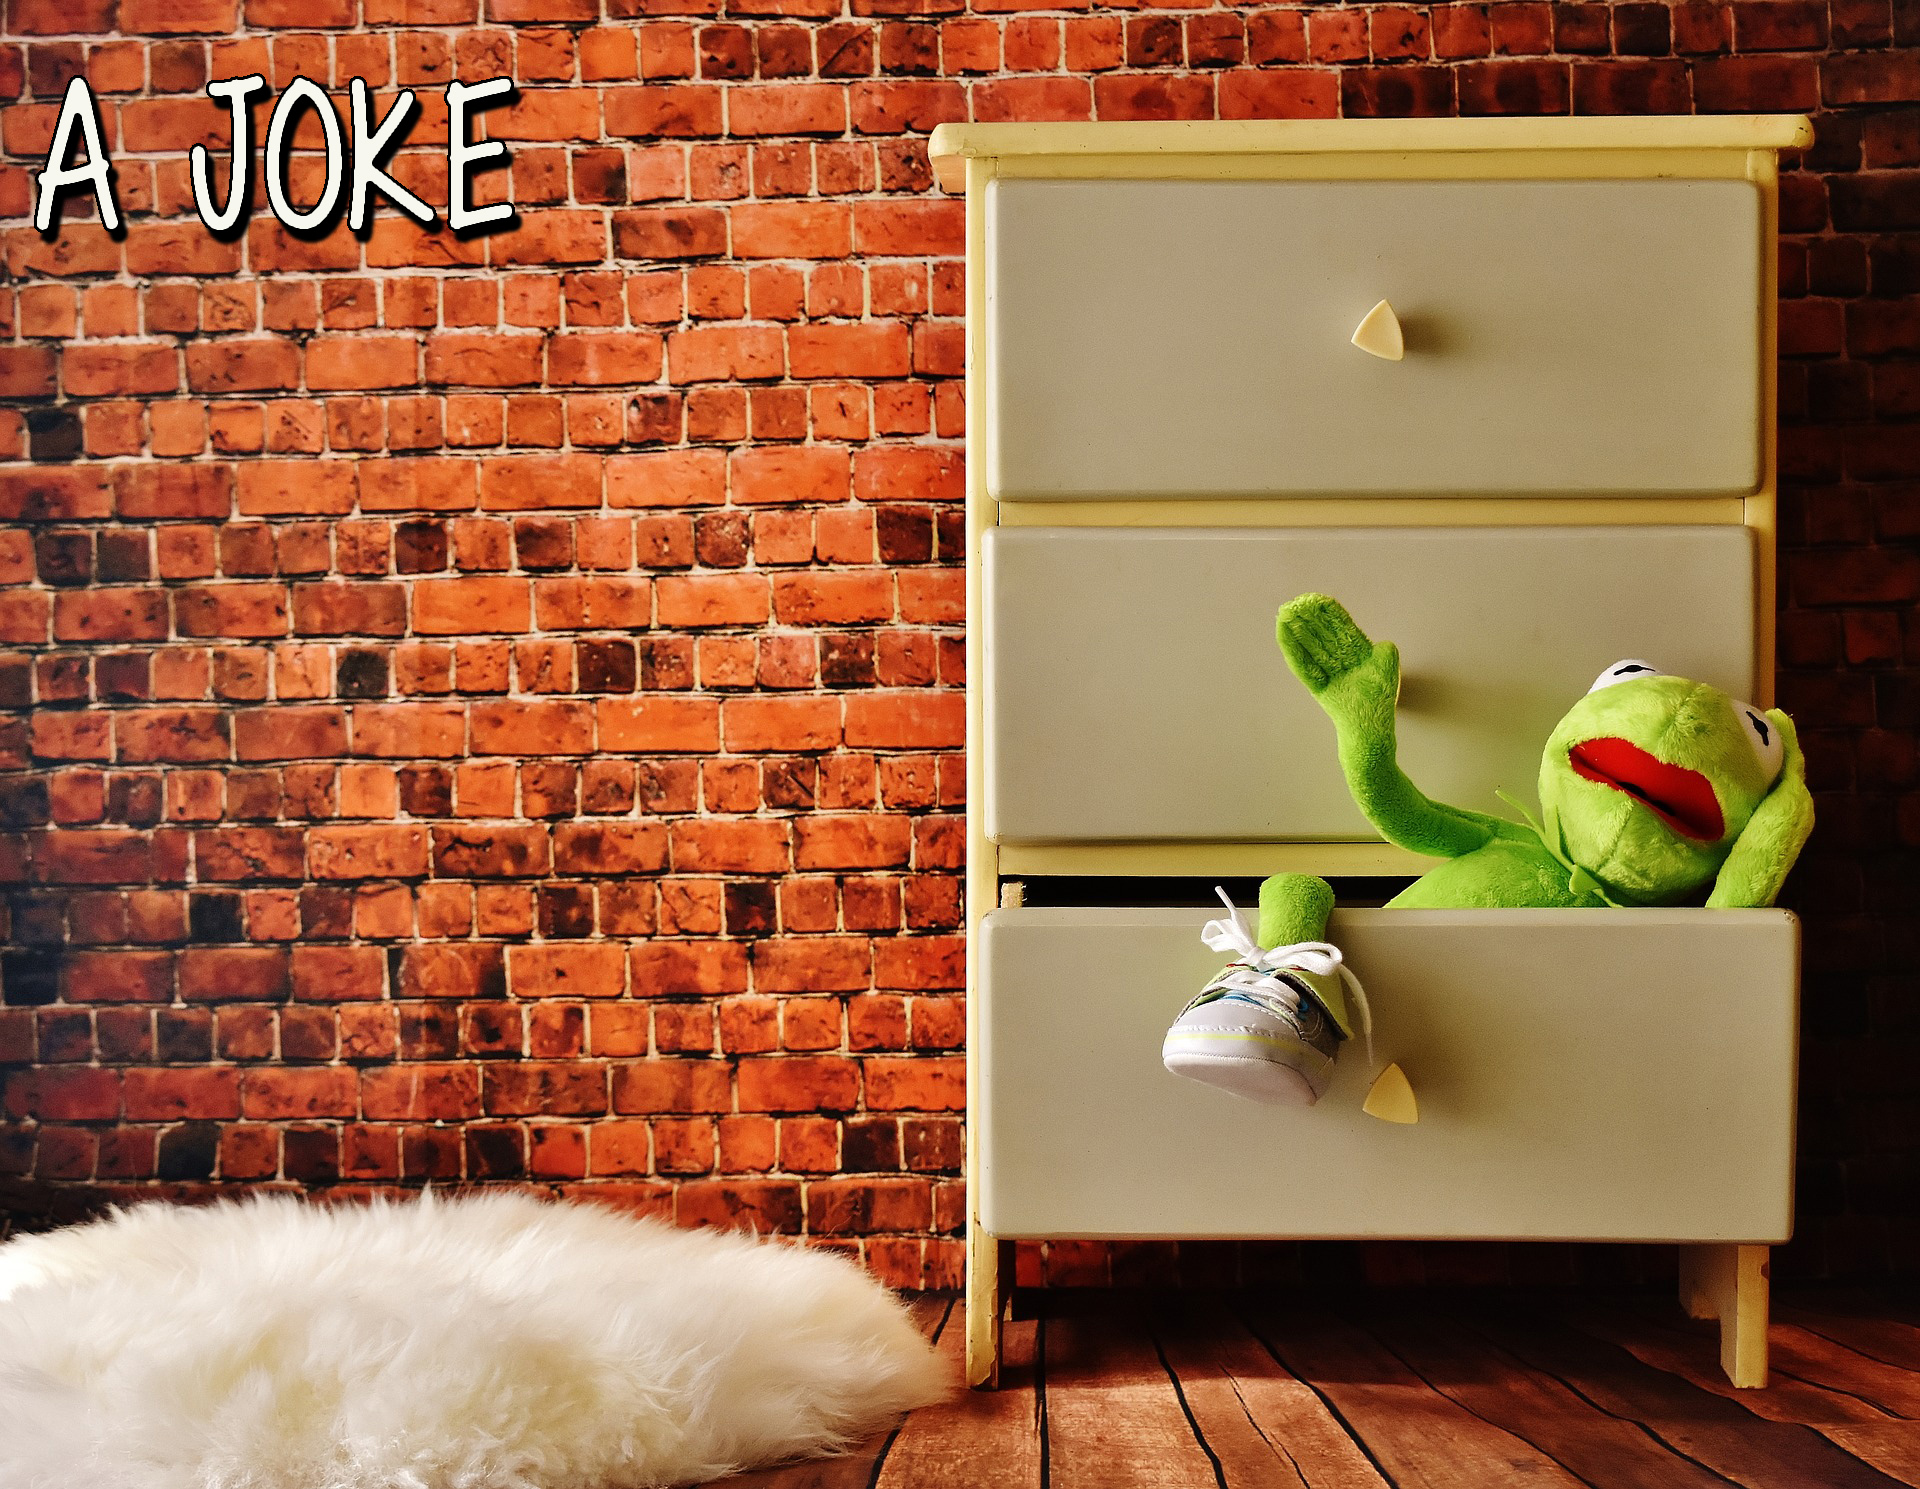 cabinet-2012944_1920.jpg